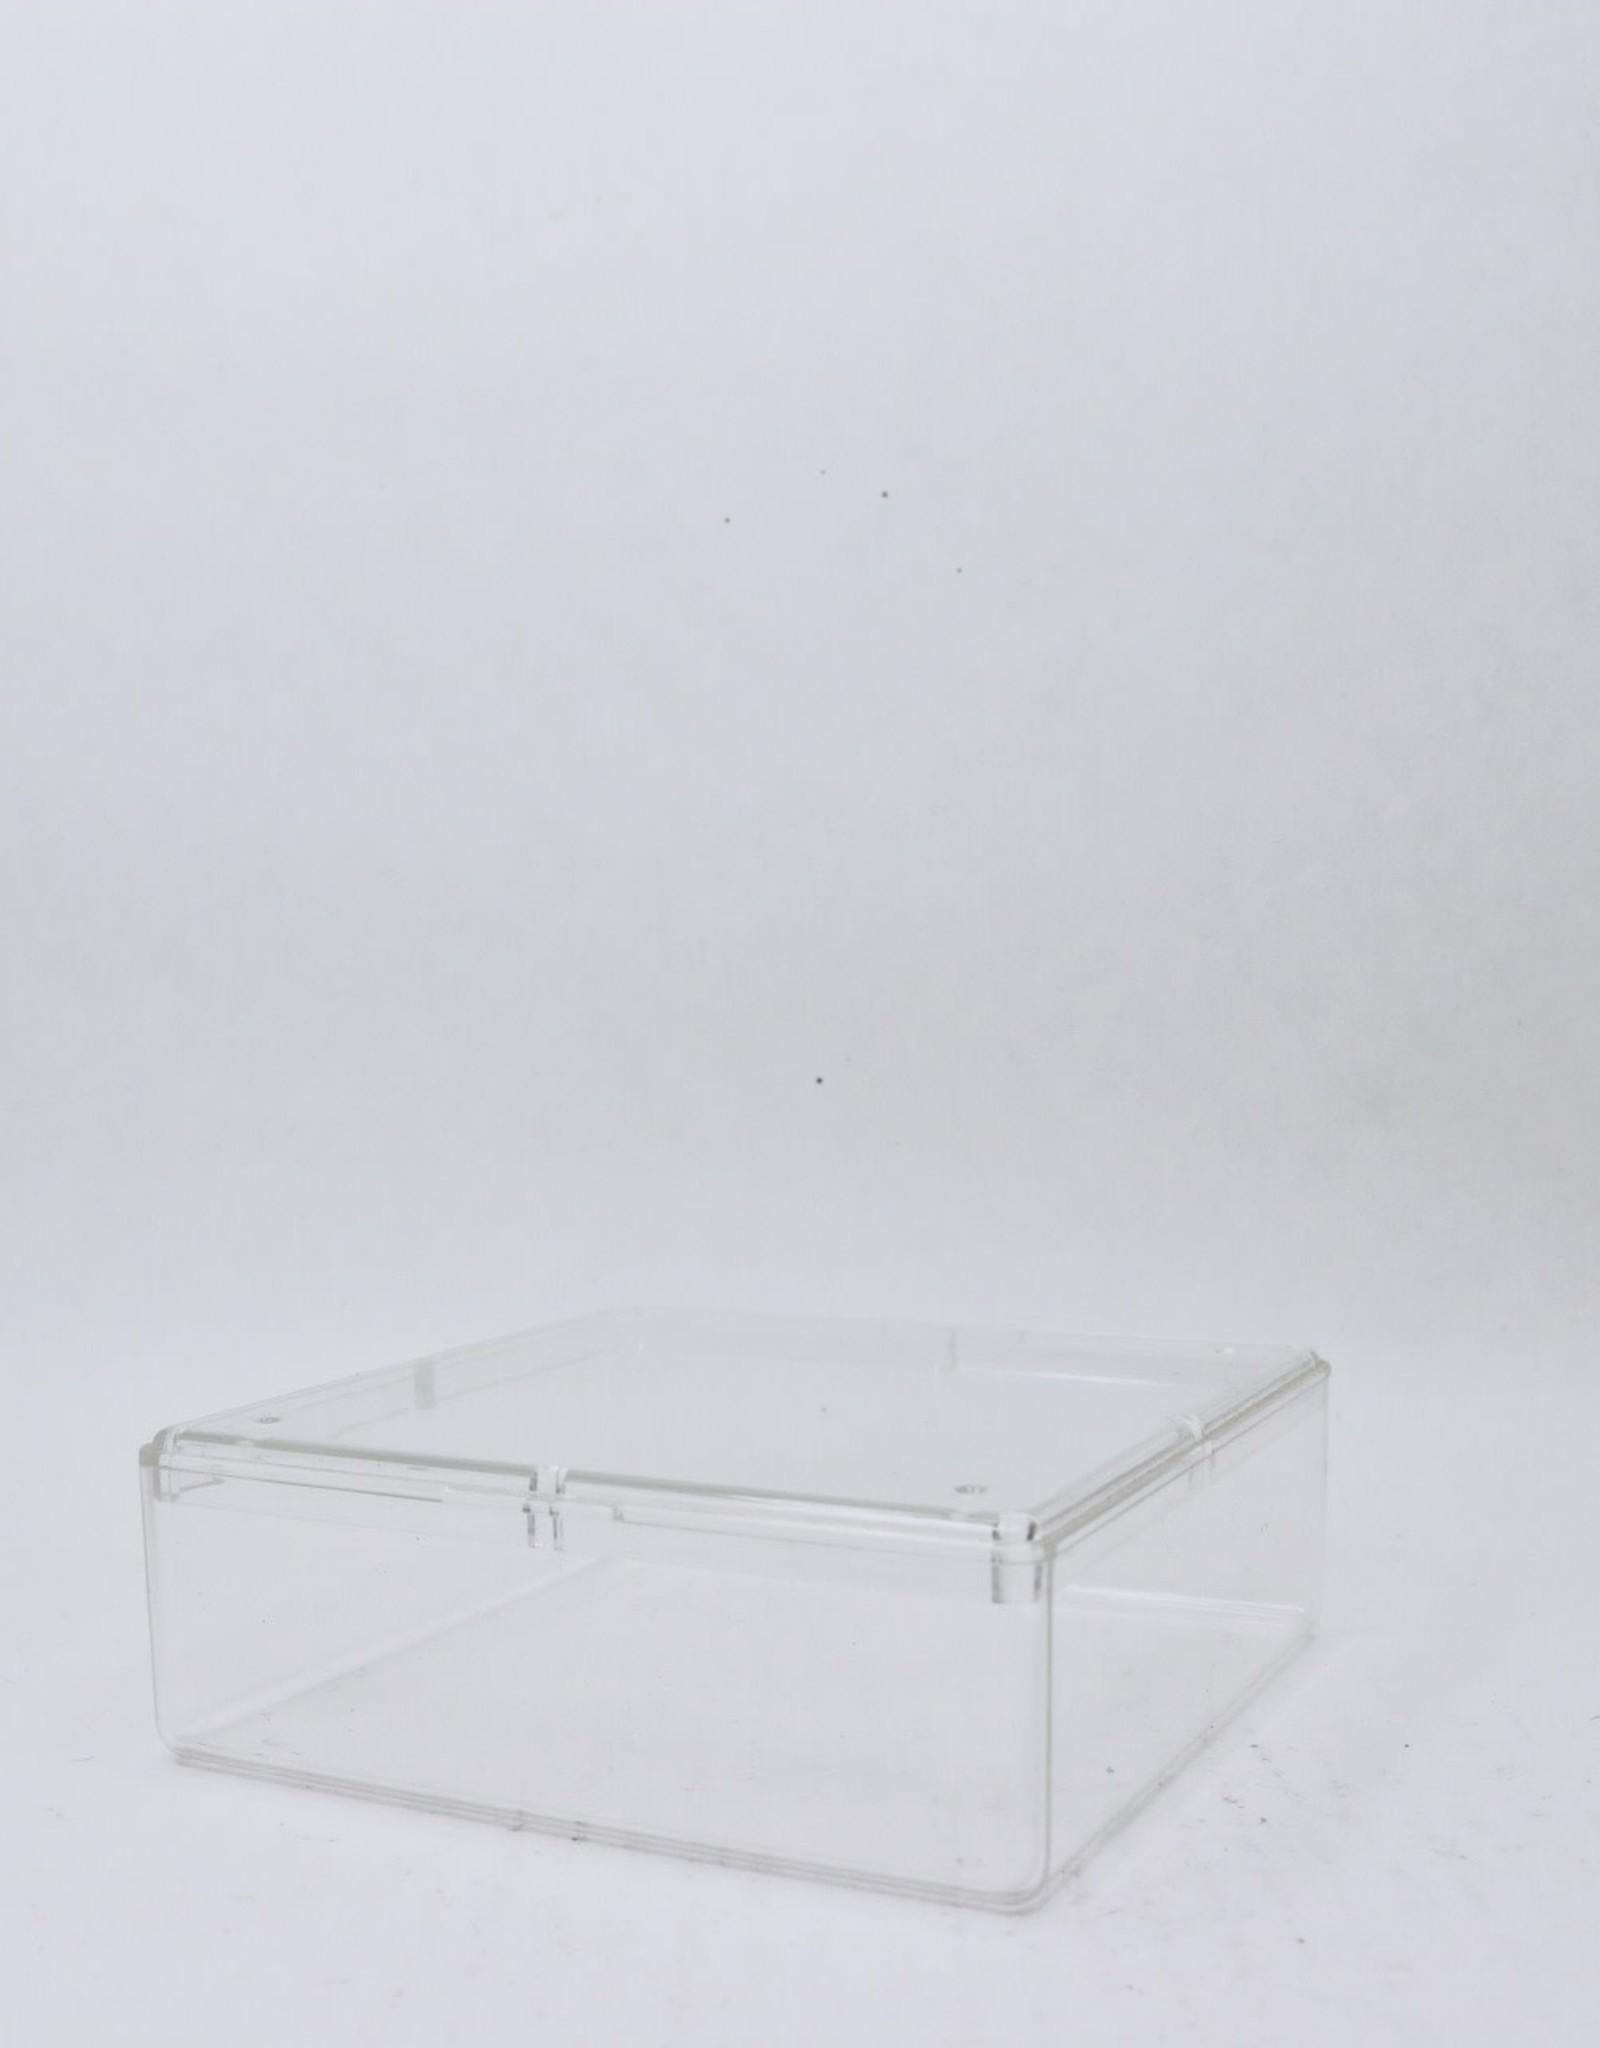 Cut-Comb Honey Boxes, single